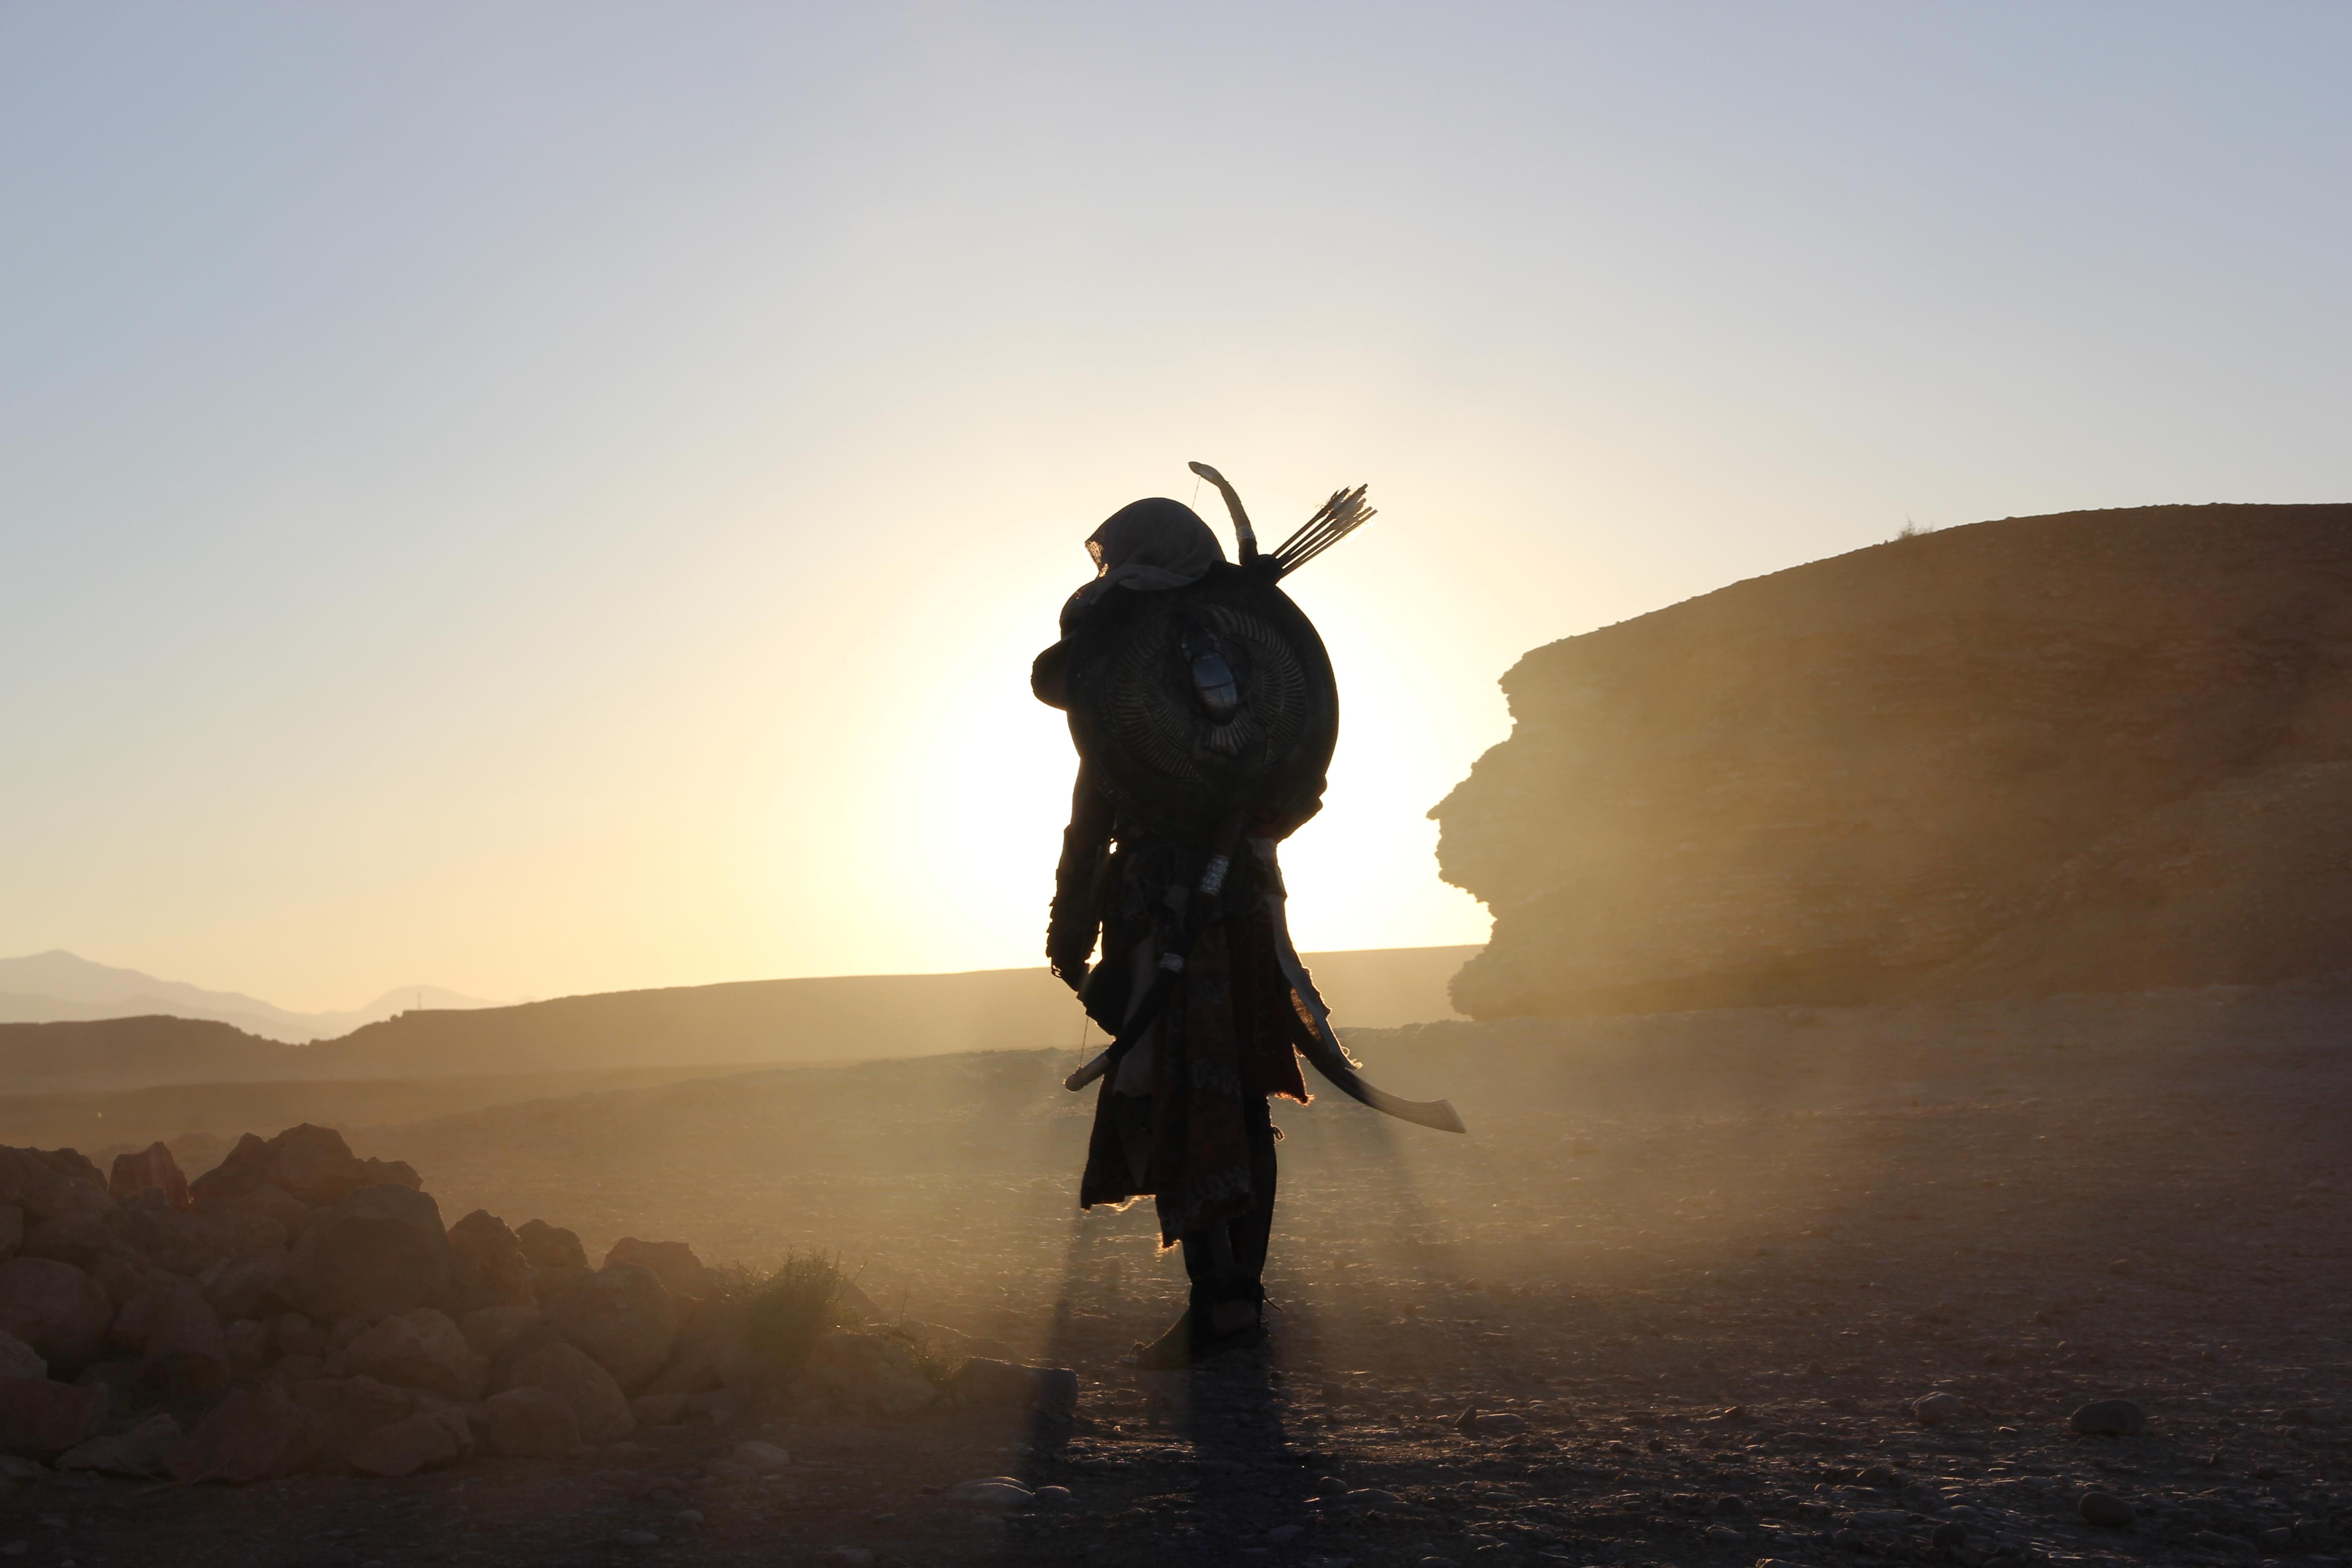 assassins_creed_origins_live_action_trailer_snap_1.jpg